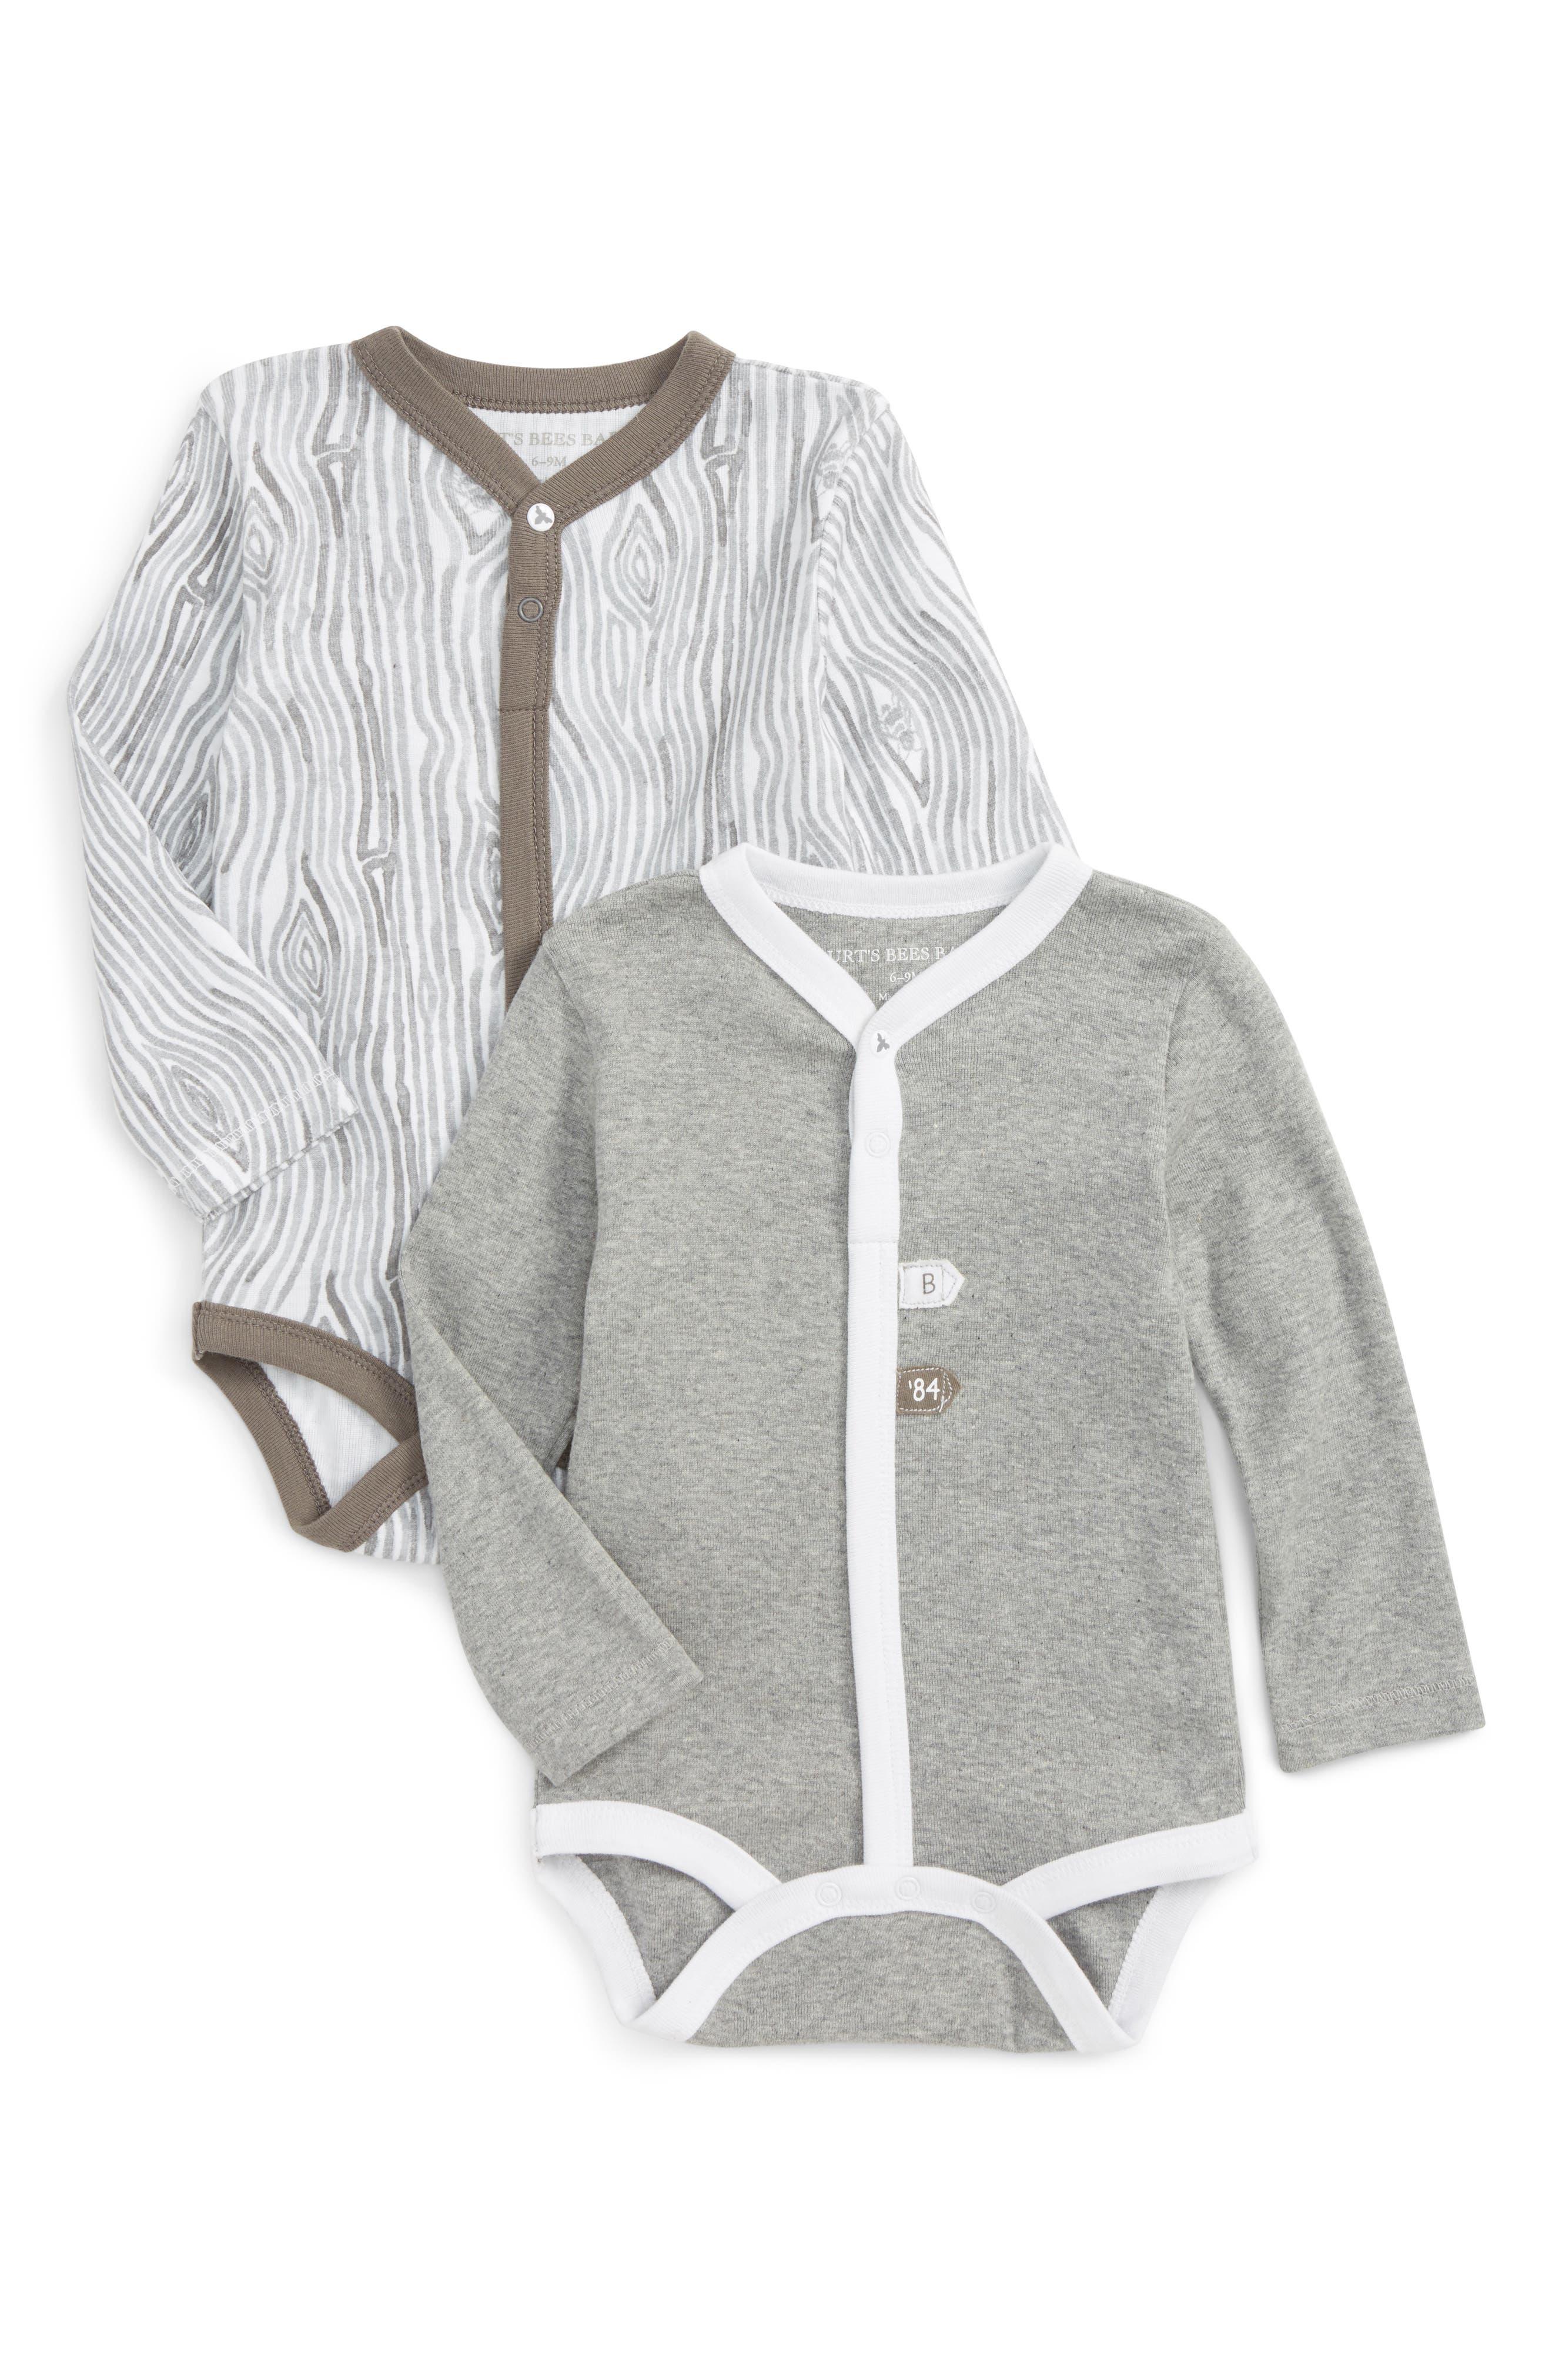 Burt's Bees Baby 2-Pack Print Organic Cotton Bodysuits (Baby Boys)